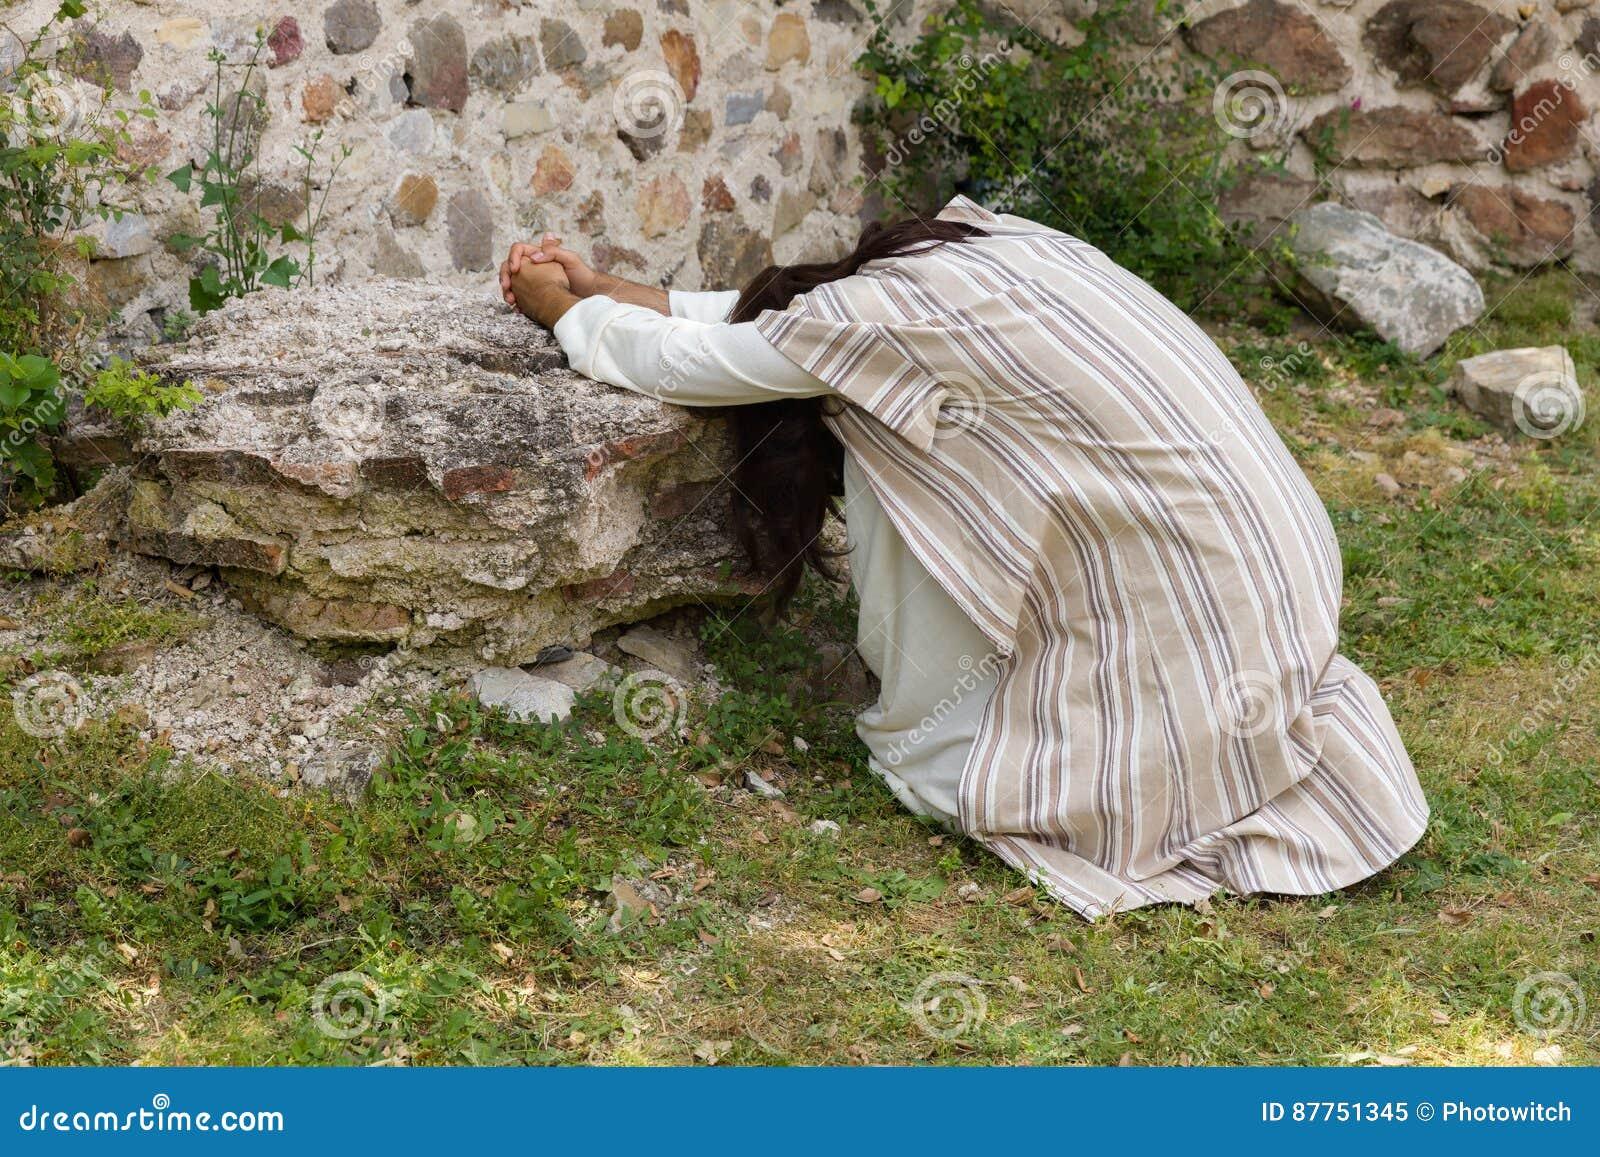 jesus praying on the mount of olives royaltyfree cartoon